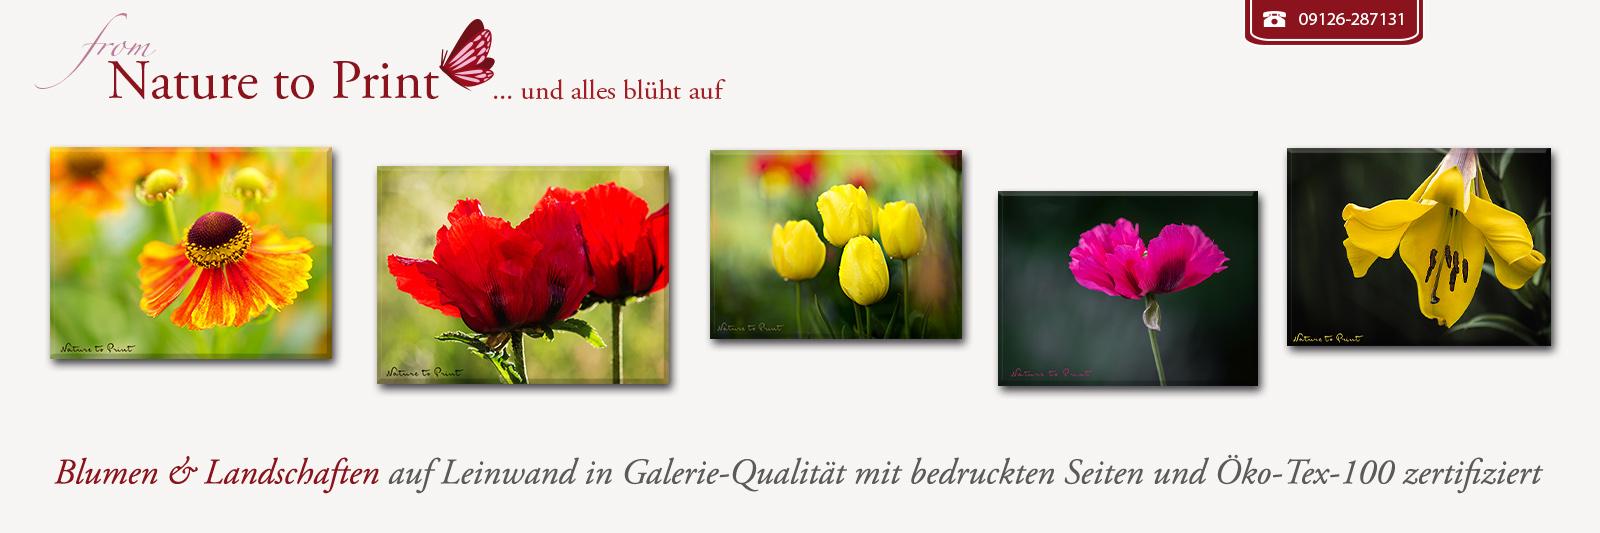 Postereck 3490 Tulpen Blume Blüte Deko Pflanze Knospe Flora Poster /& Leinwand